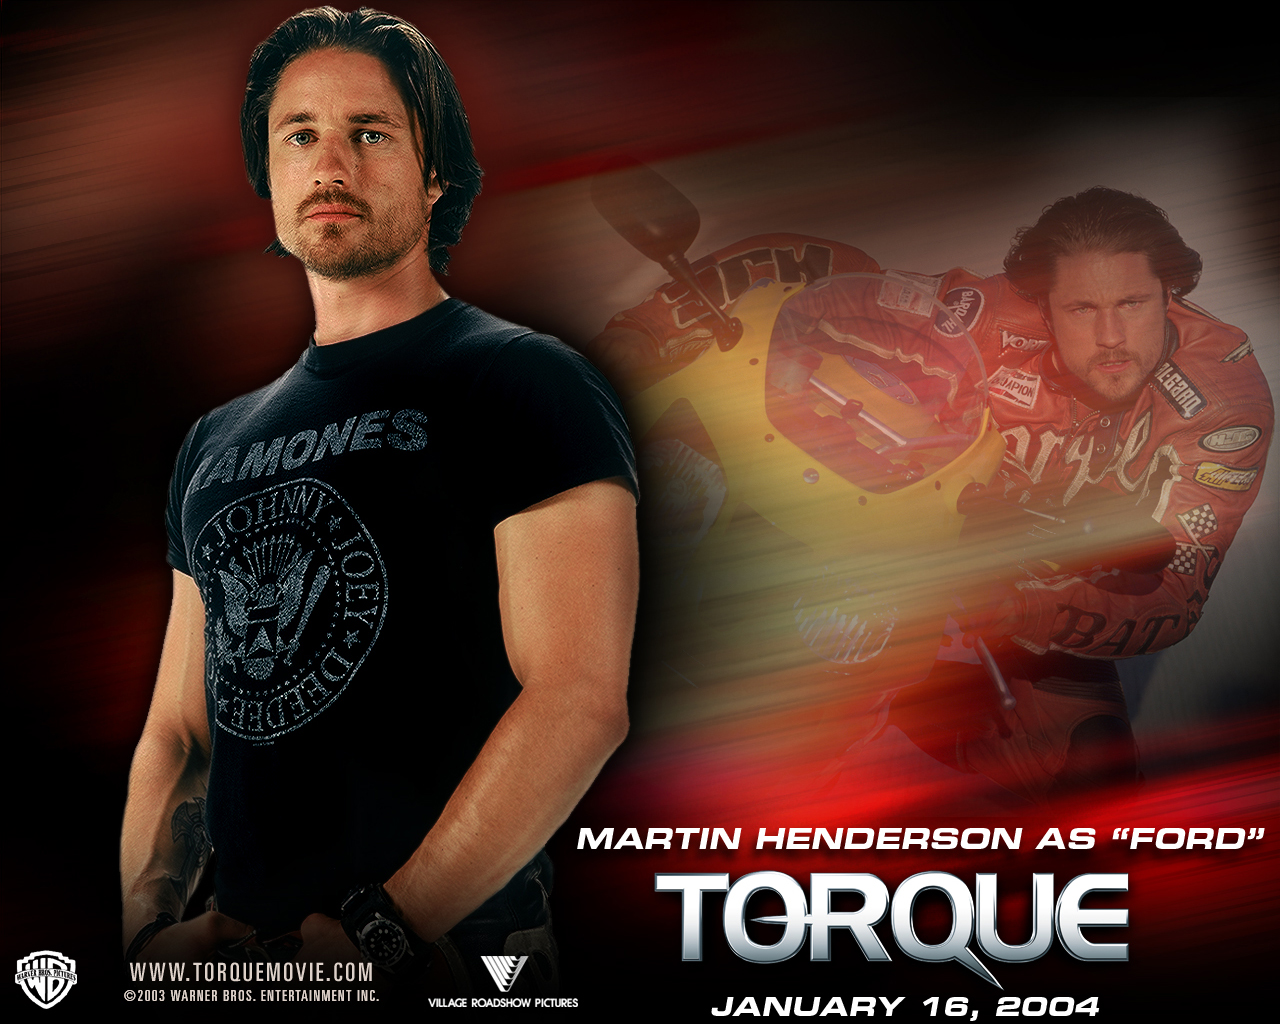 Torque Widescreen Edition Movie free download HD 720p